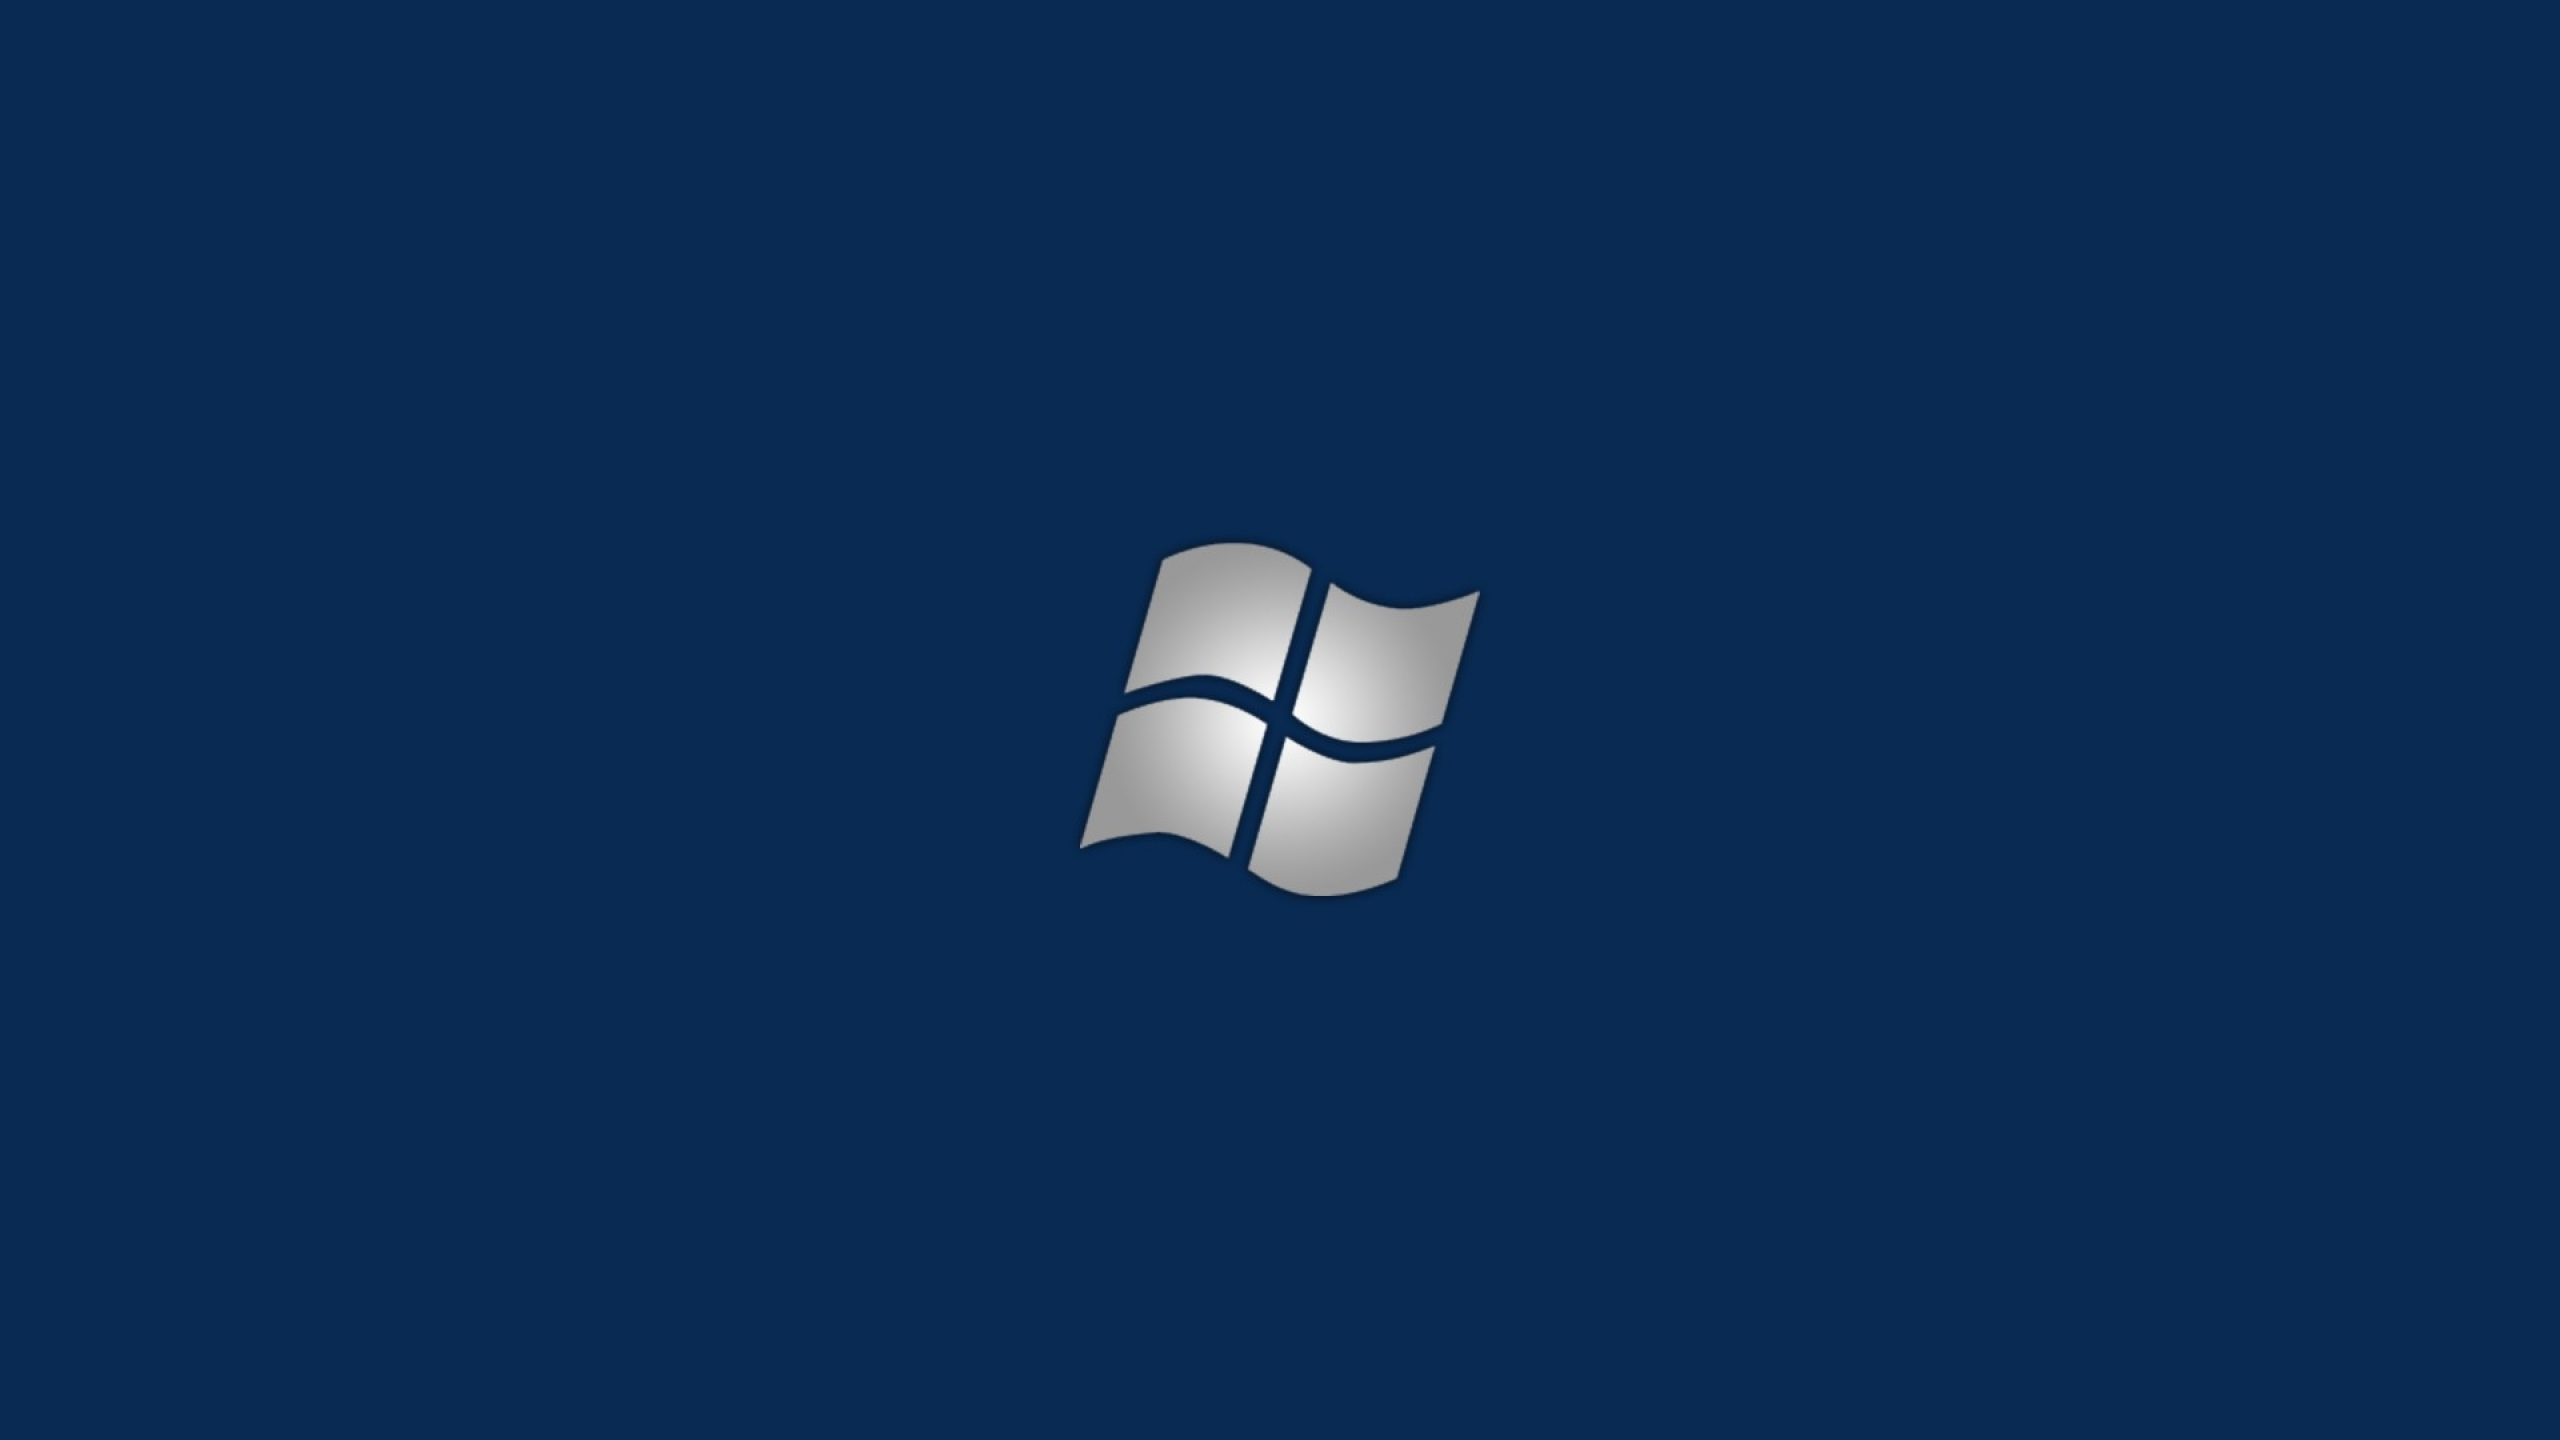 microsoft windows 1920x1080 wallpaper Wallpaper Wallpapers 2560x1440